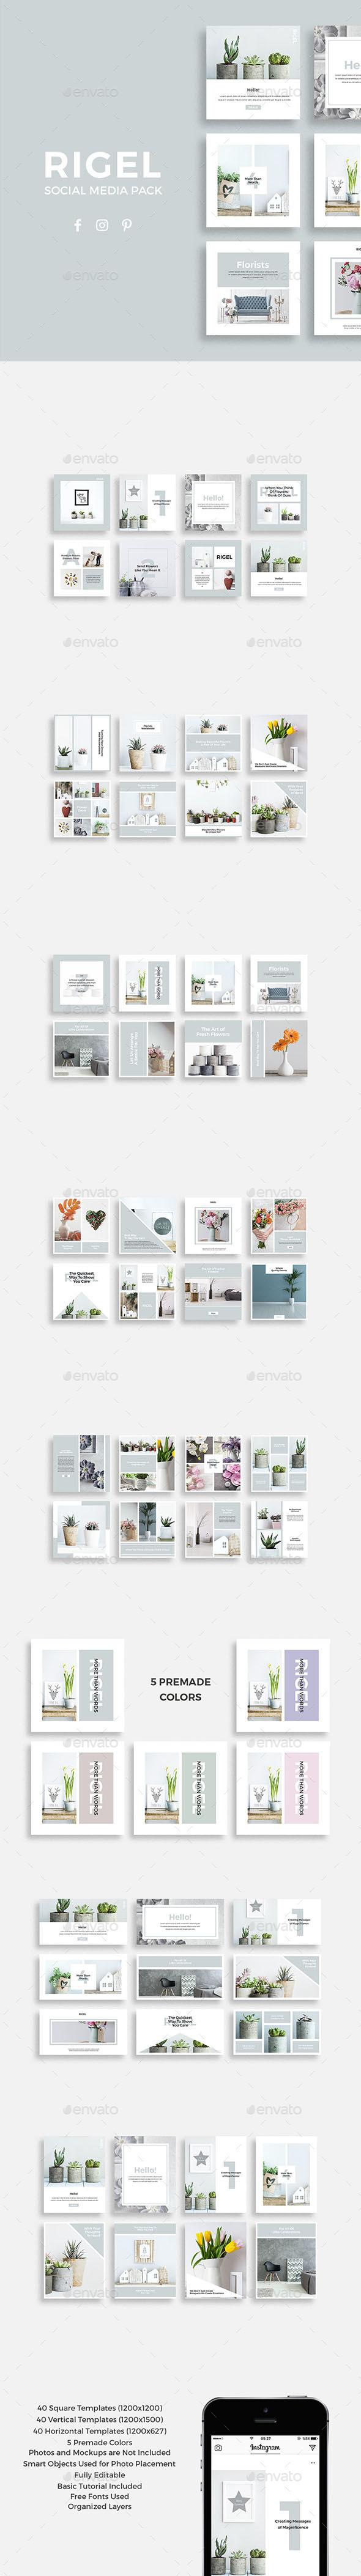 Rigel Social Media Pack - Social Media Web Elements